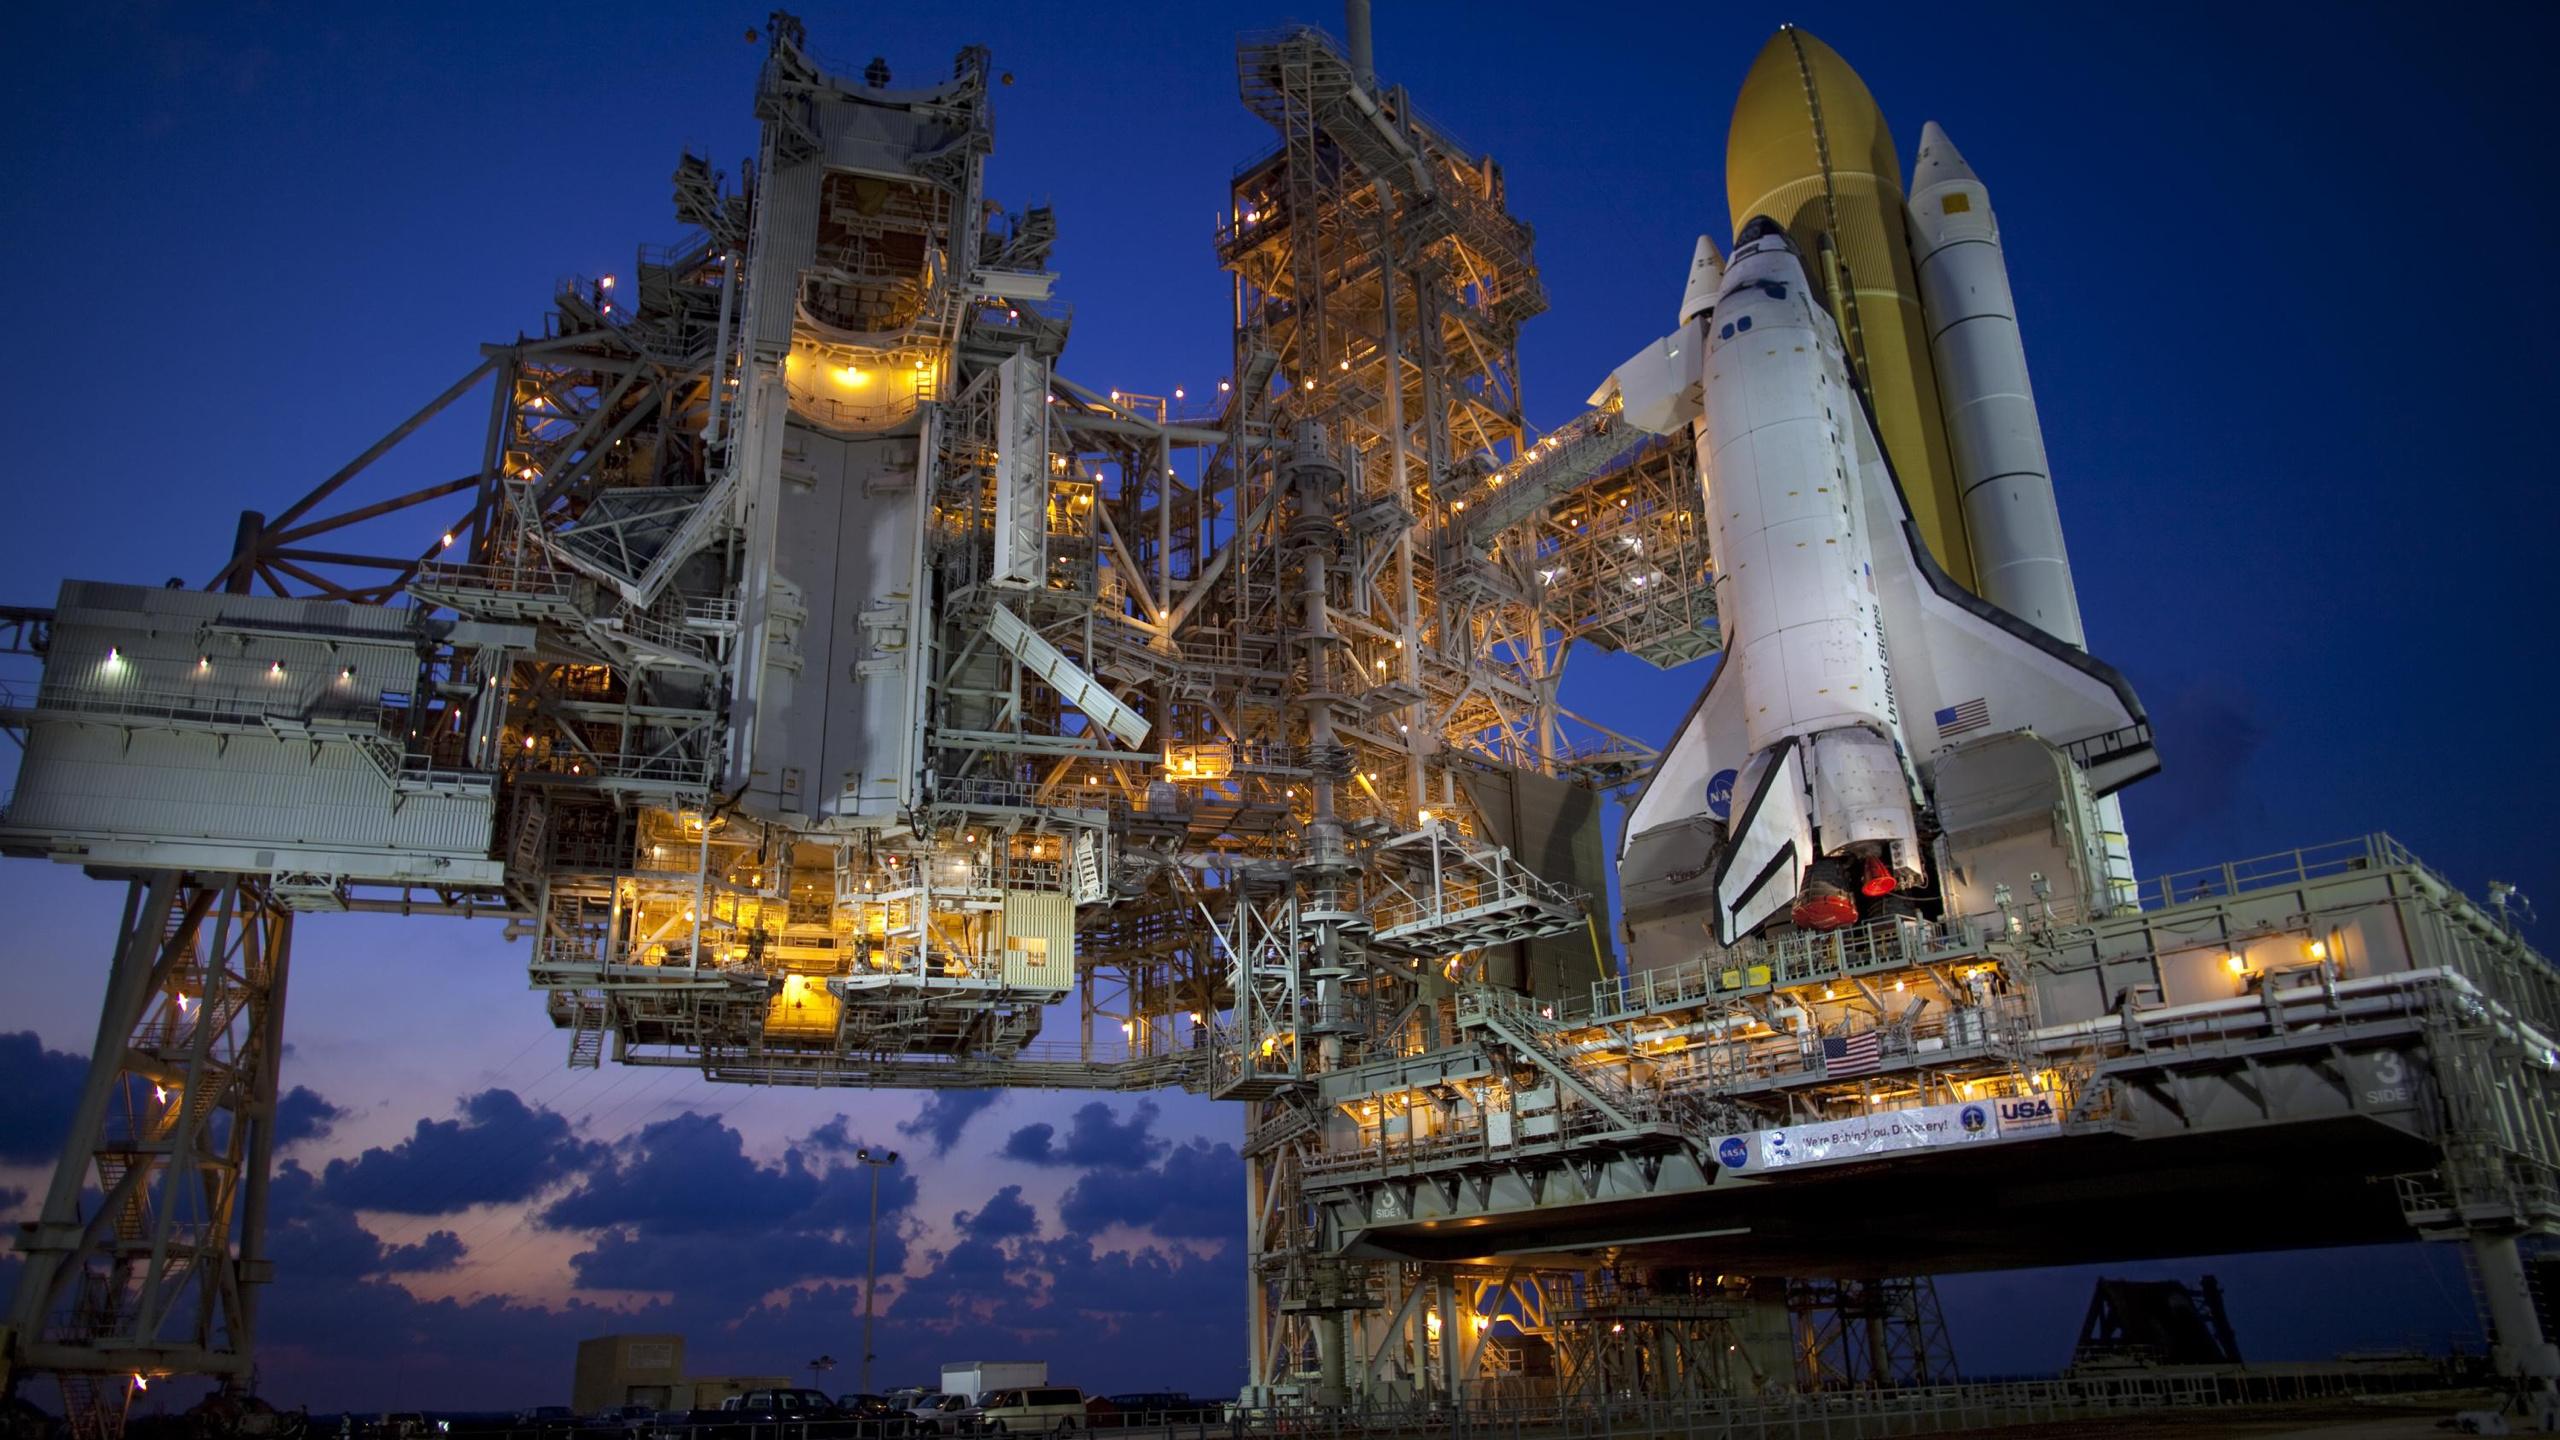 ... Wallpaper 1920x1200 Space Shuttle HD Wallpaper 2560x1440 Space Shuttle